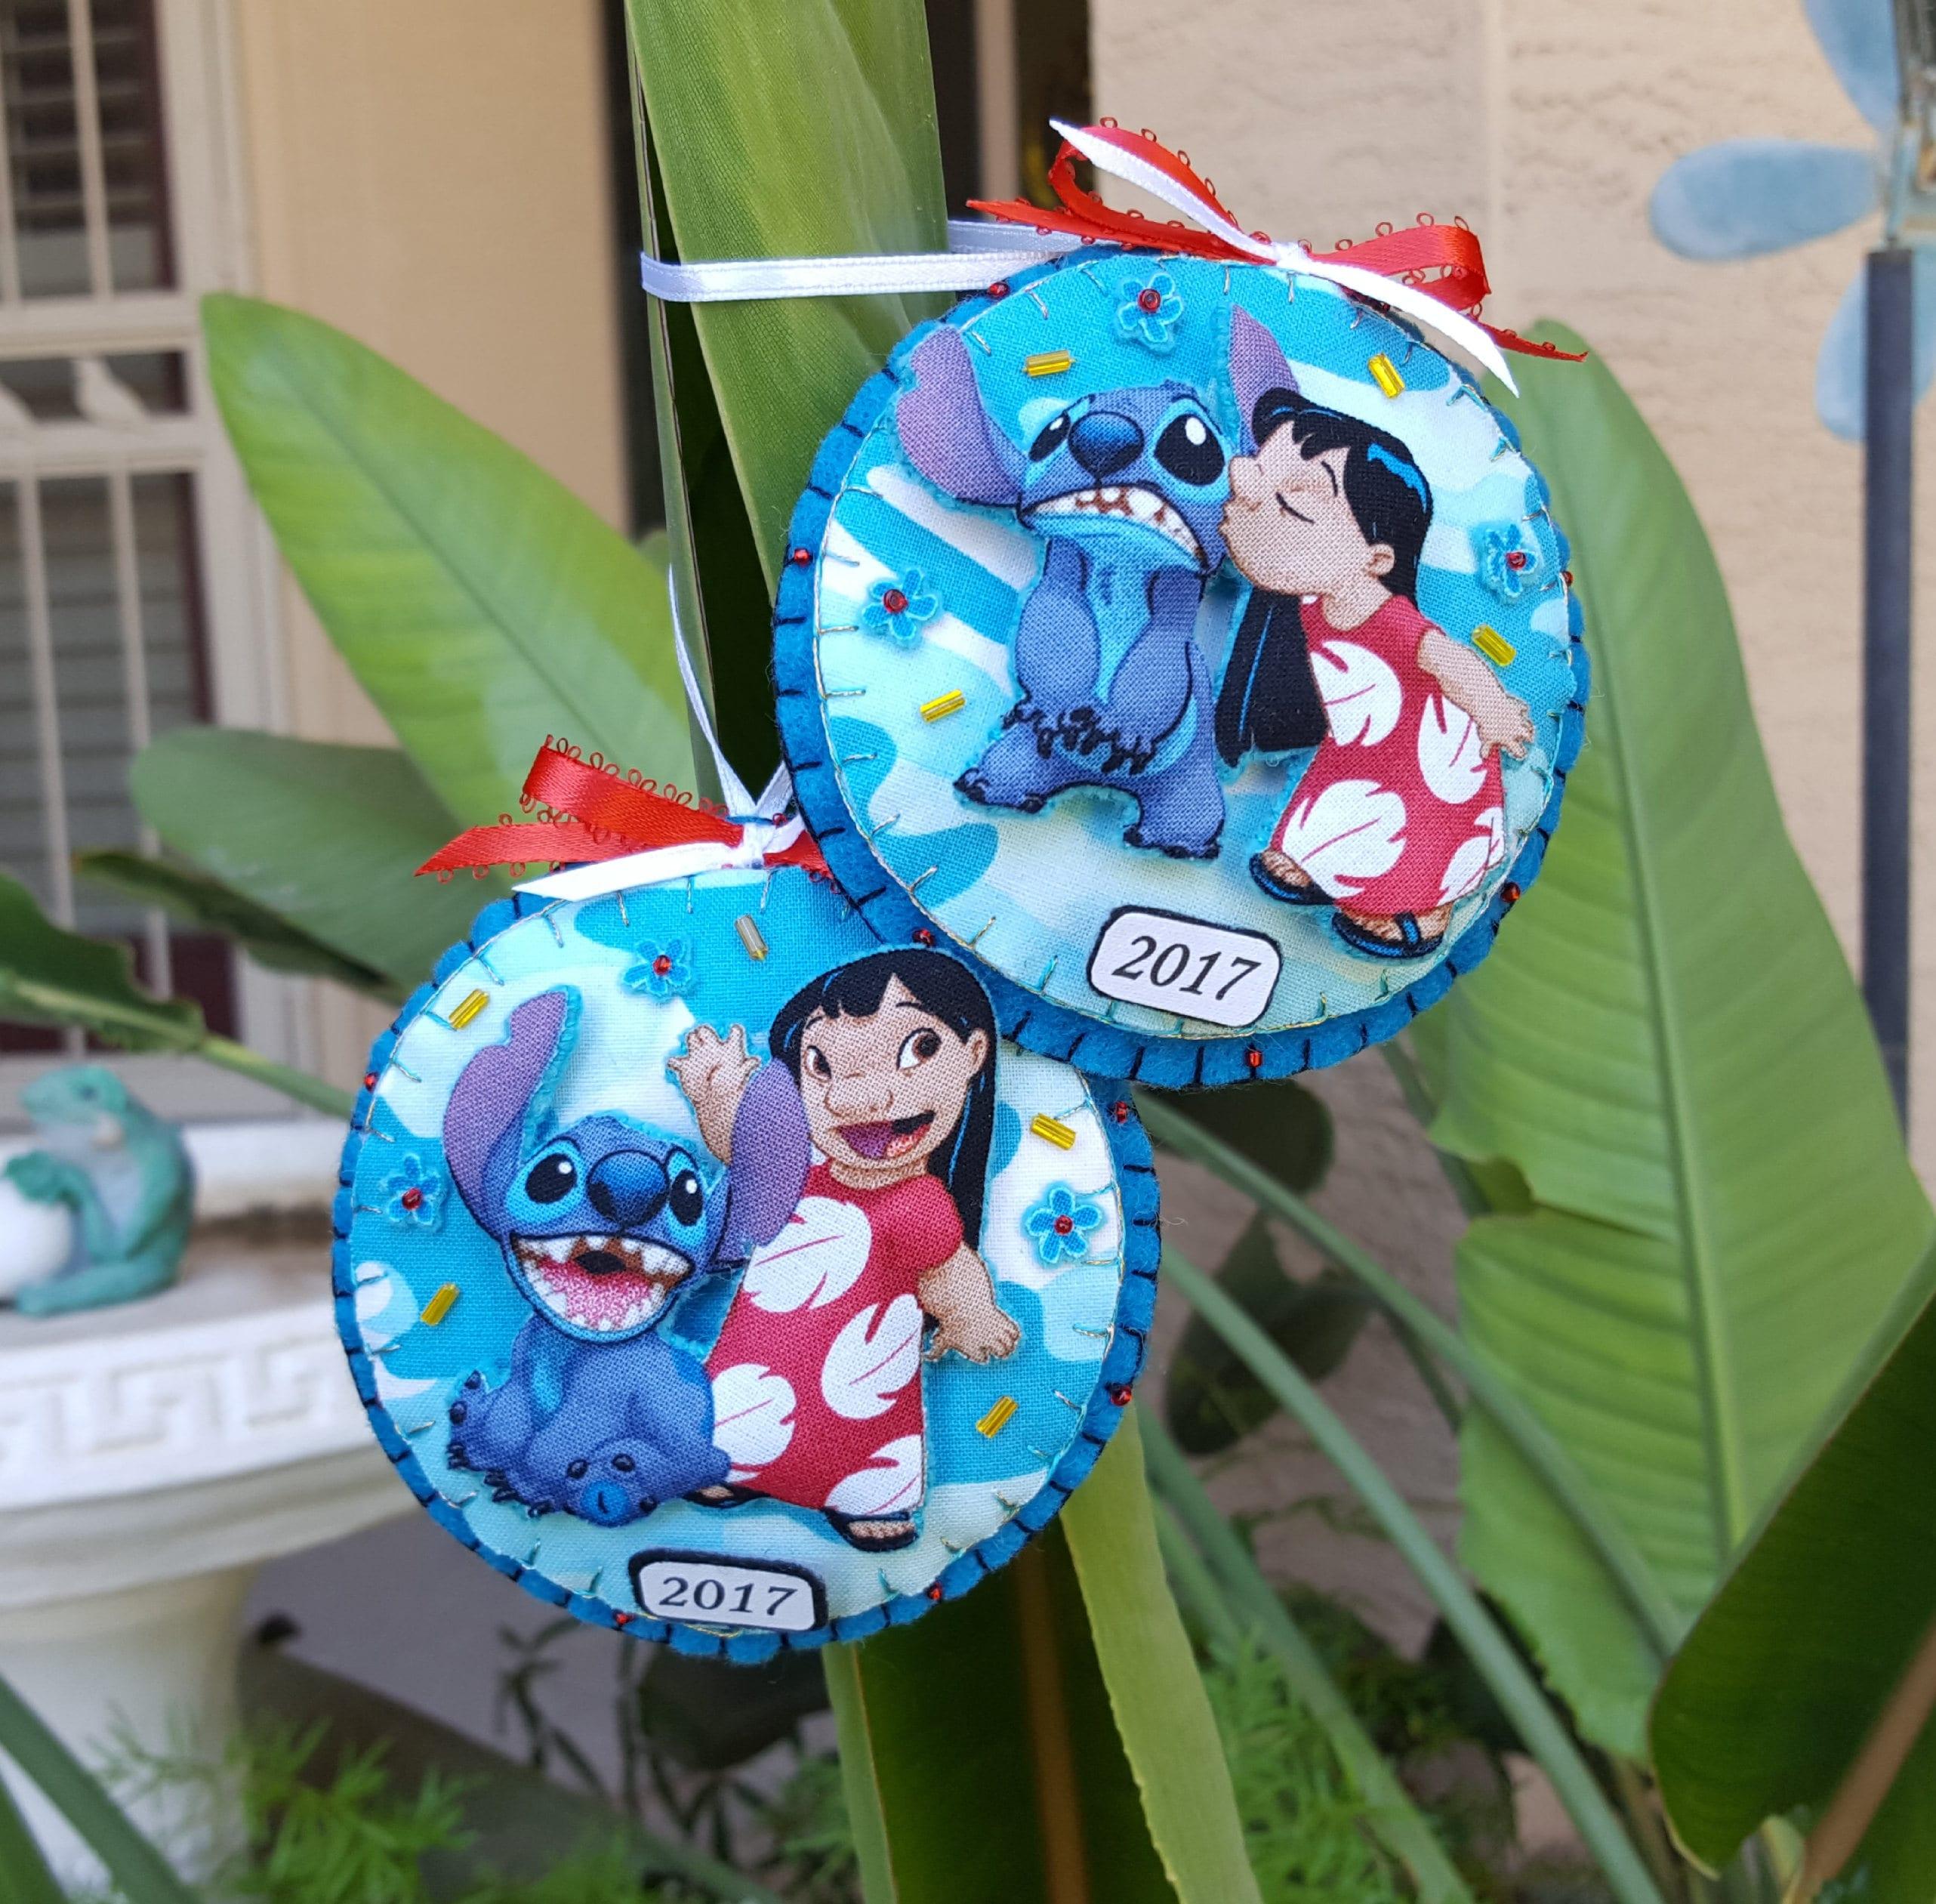 Used Disney Christmas Decorations: Disney Lilo And Stitch Felt And Fabric Ornament-3D